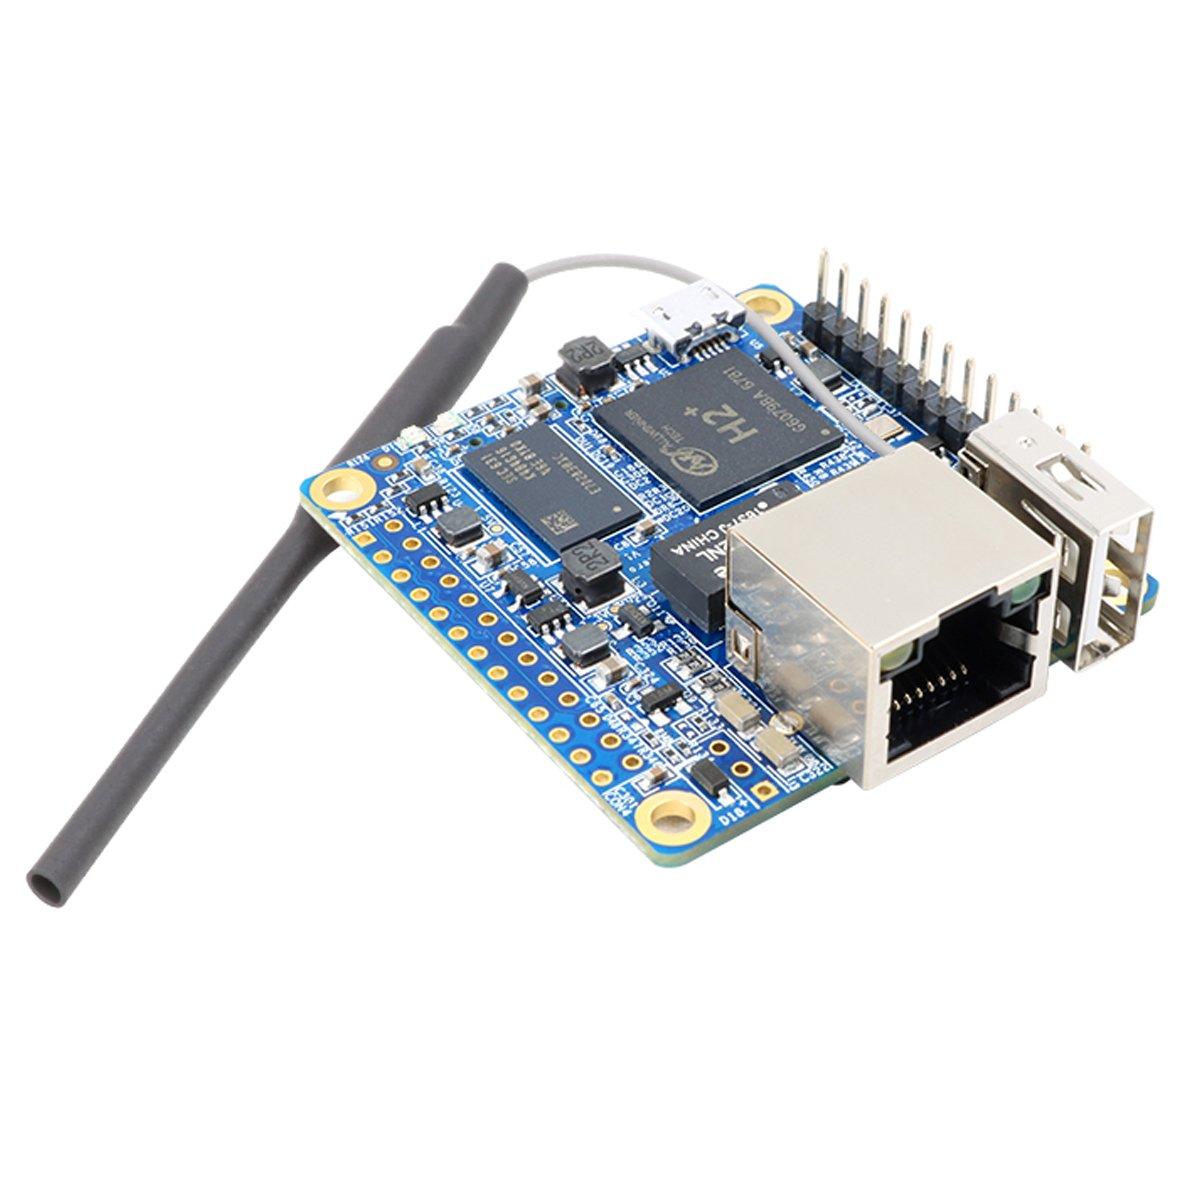 Makerfocus Orange Pi Zero H2 Quad Core Open-source 256MB Development Board with Wifi Antenna by MakerFocus (Image #3)